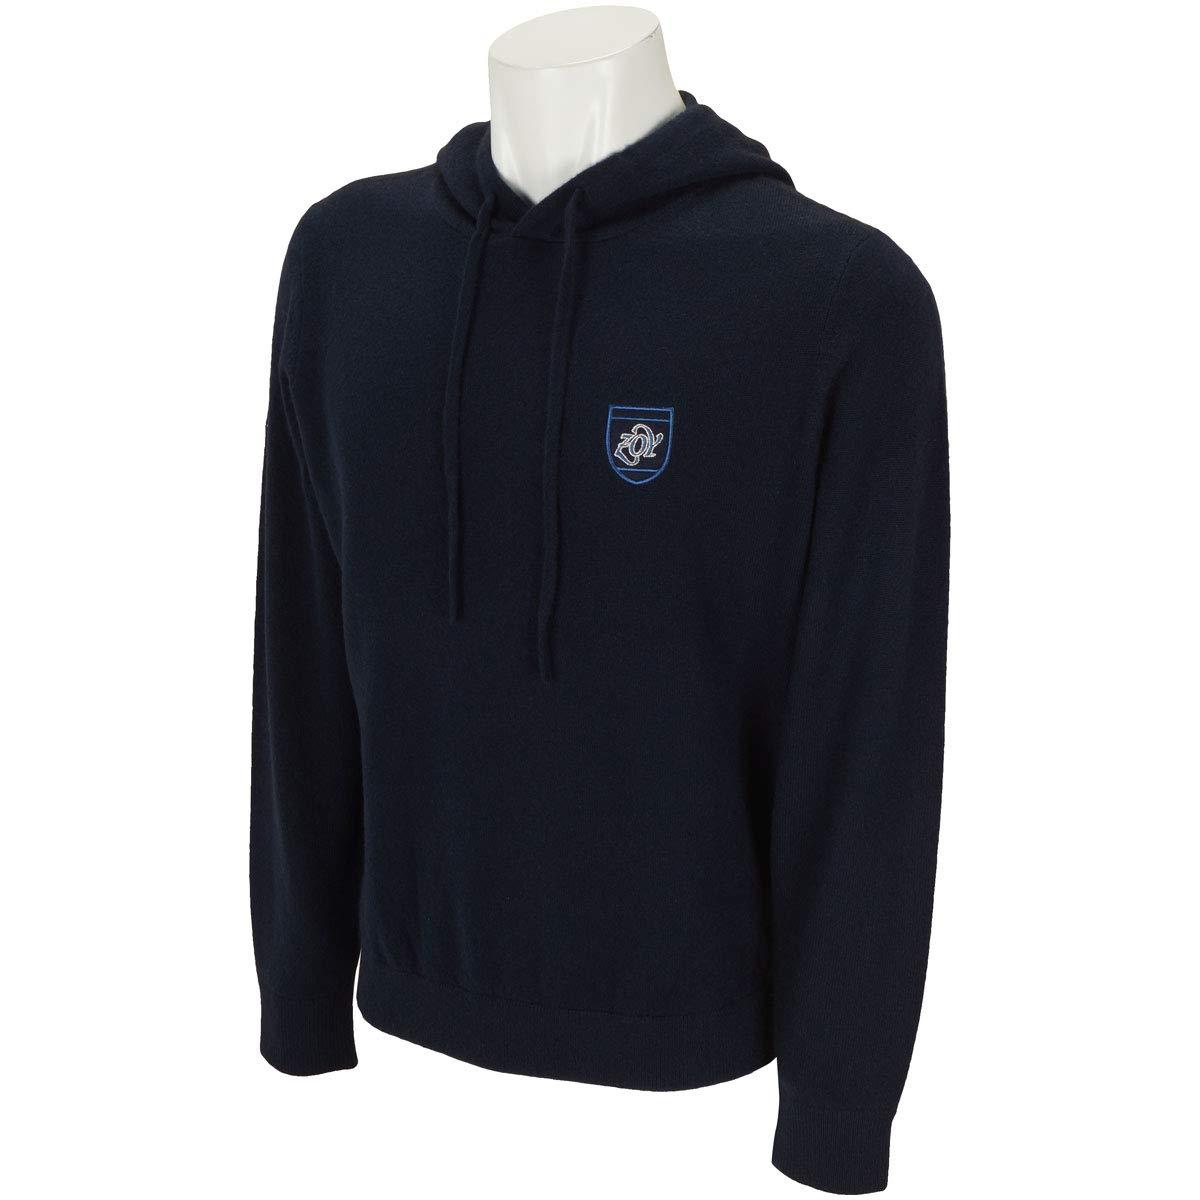 ZOY ゾーイ 中間着(セーター、トレーナー) AURORA フード付き長袖セーター LL ネイビー B07KR6LC1Q